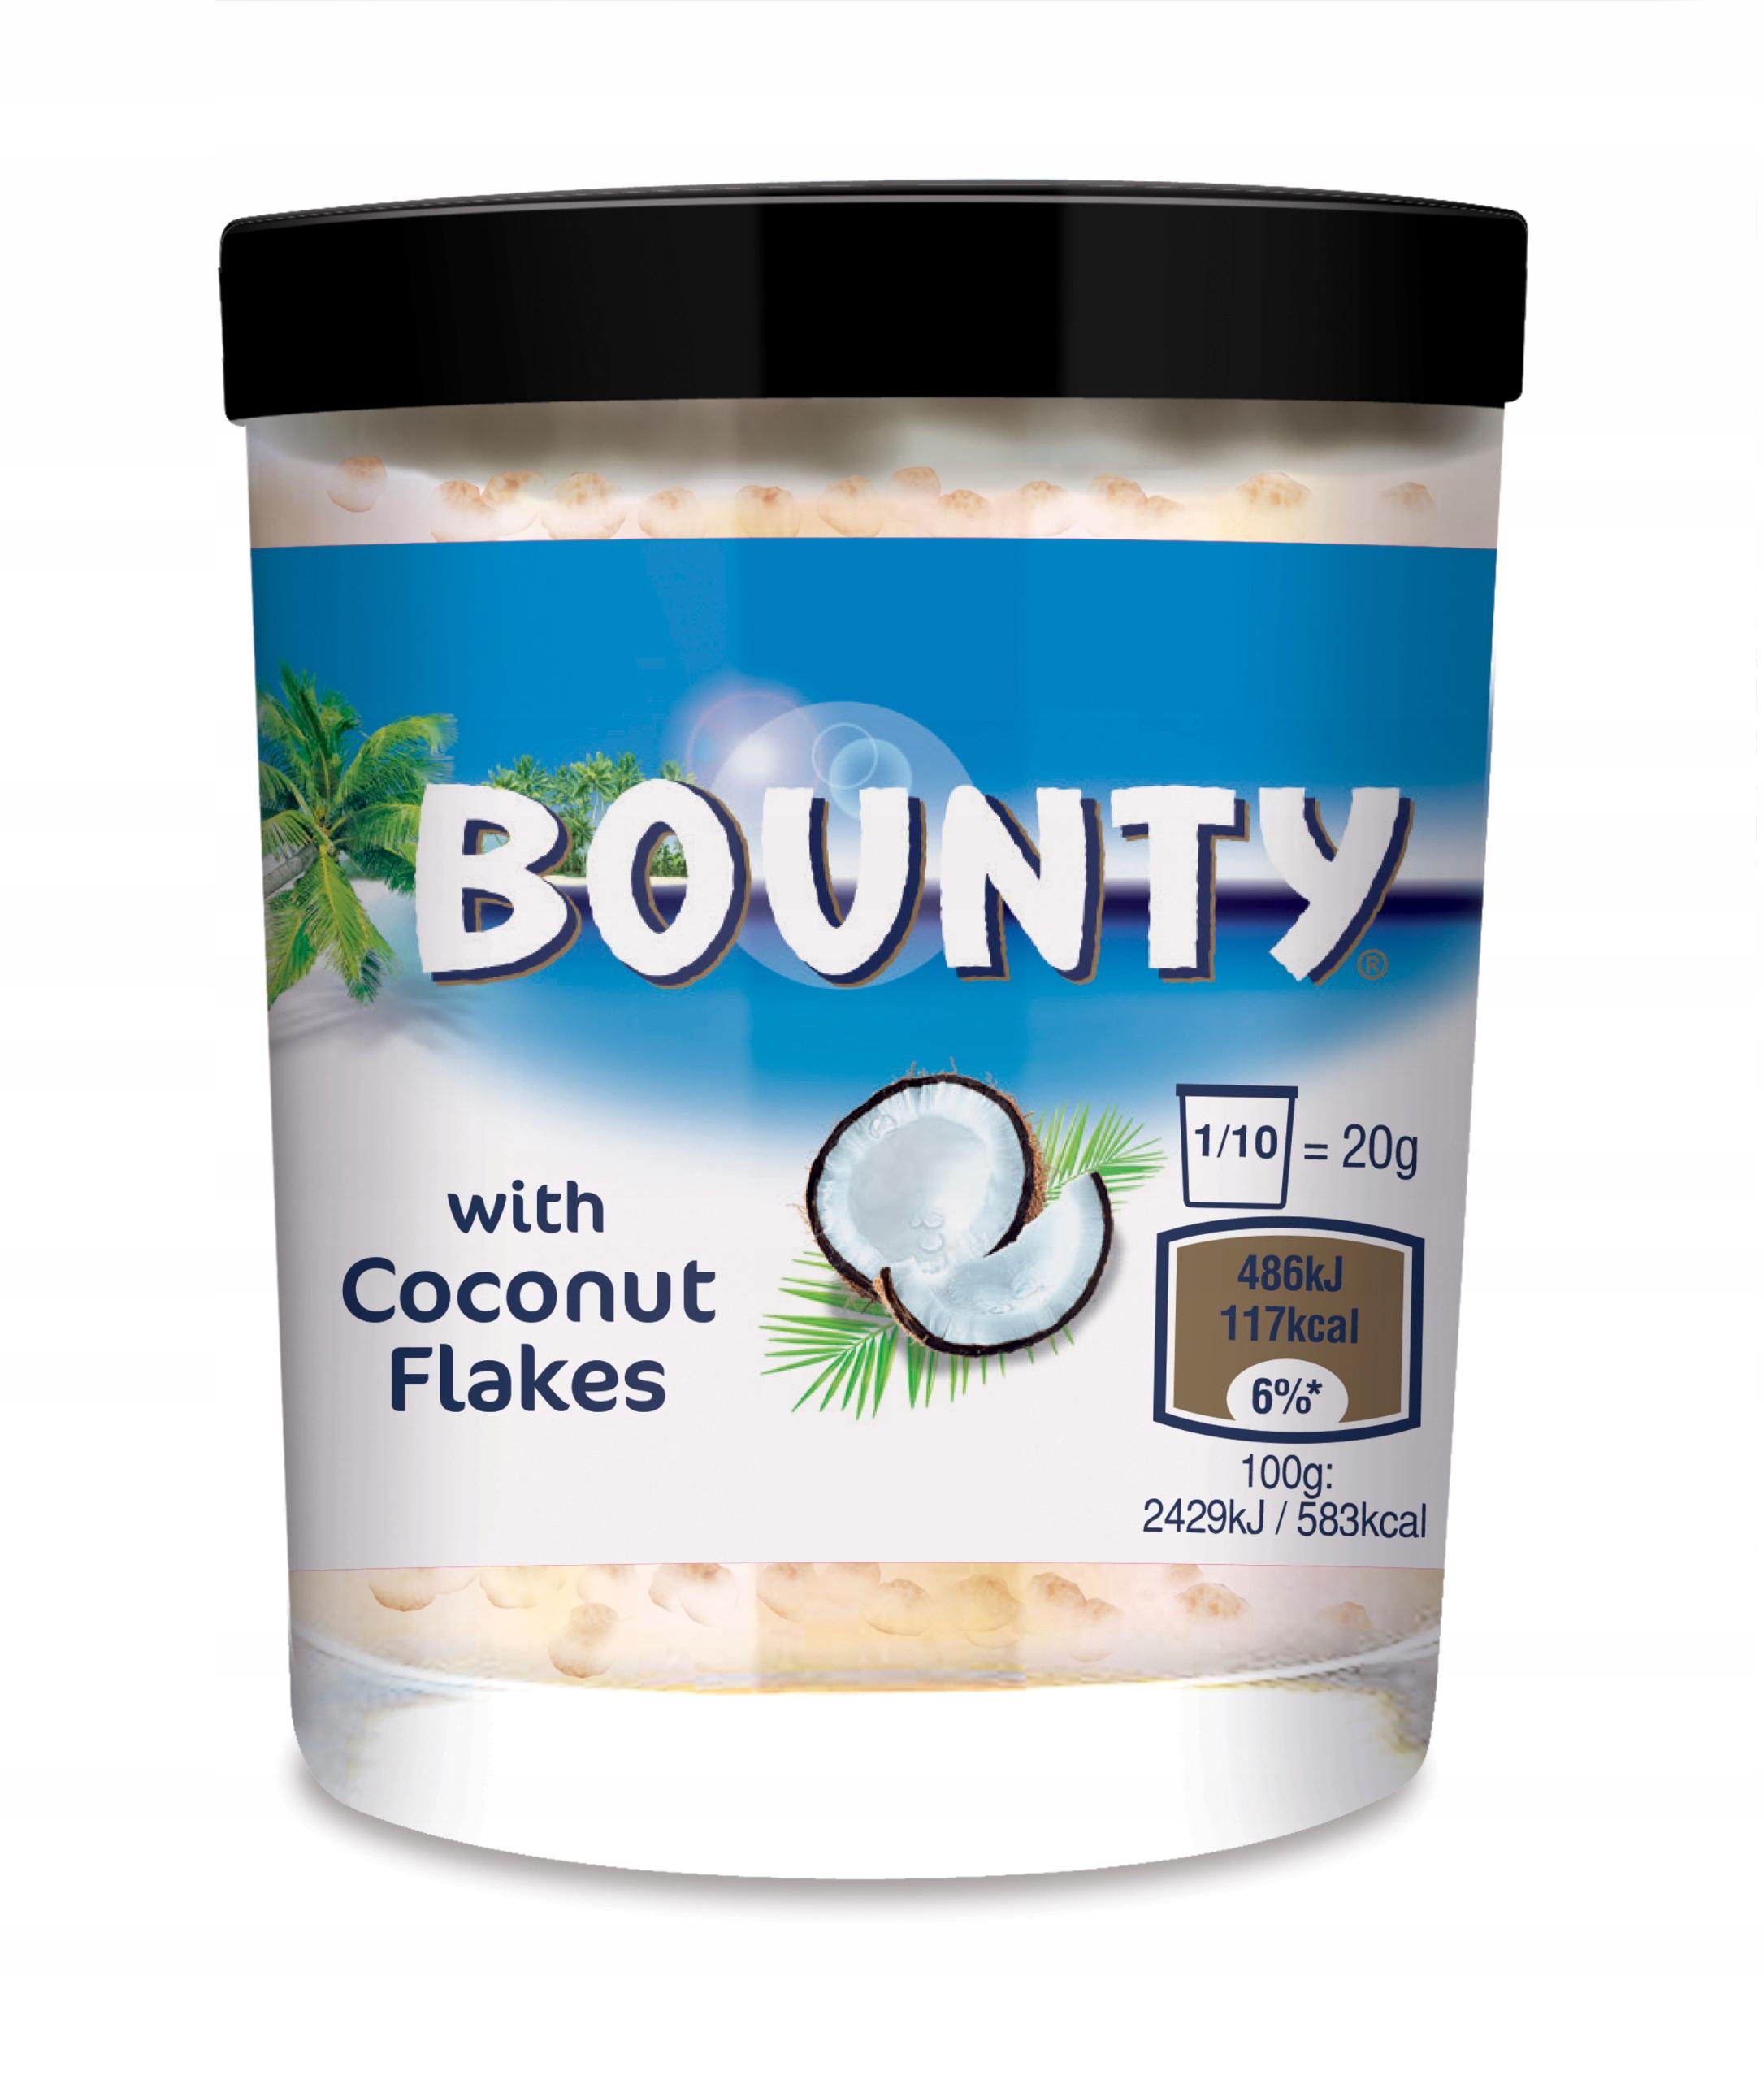 PROMOCJA Bounty krem Anglia (W-Wa)